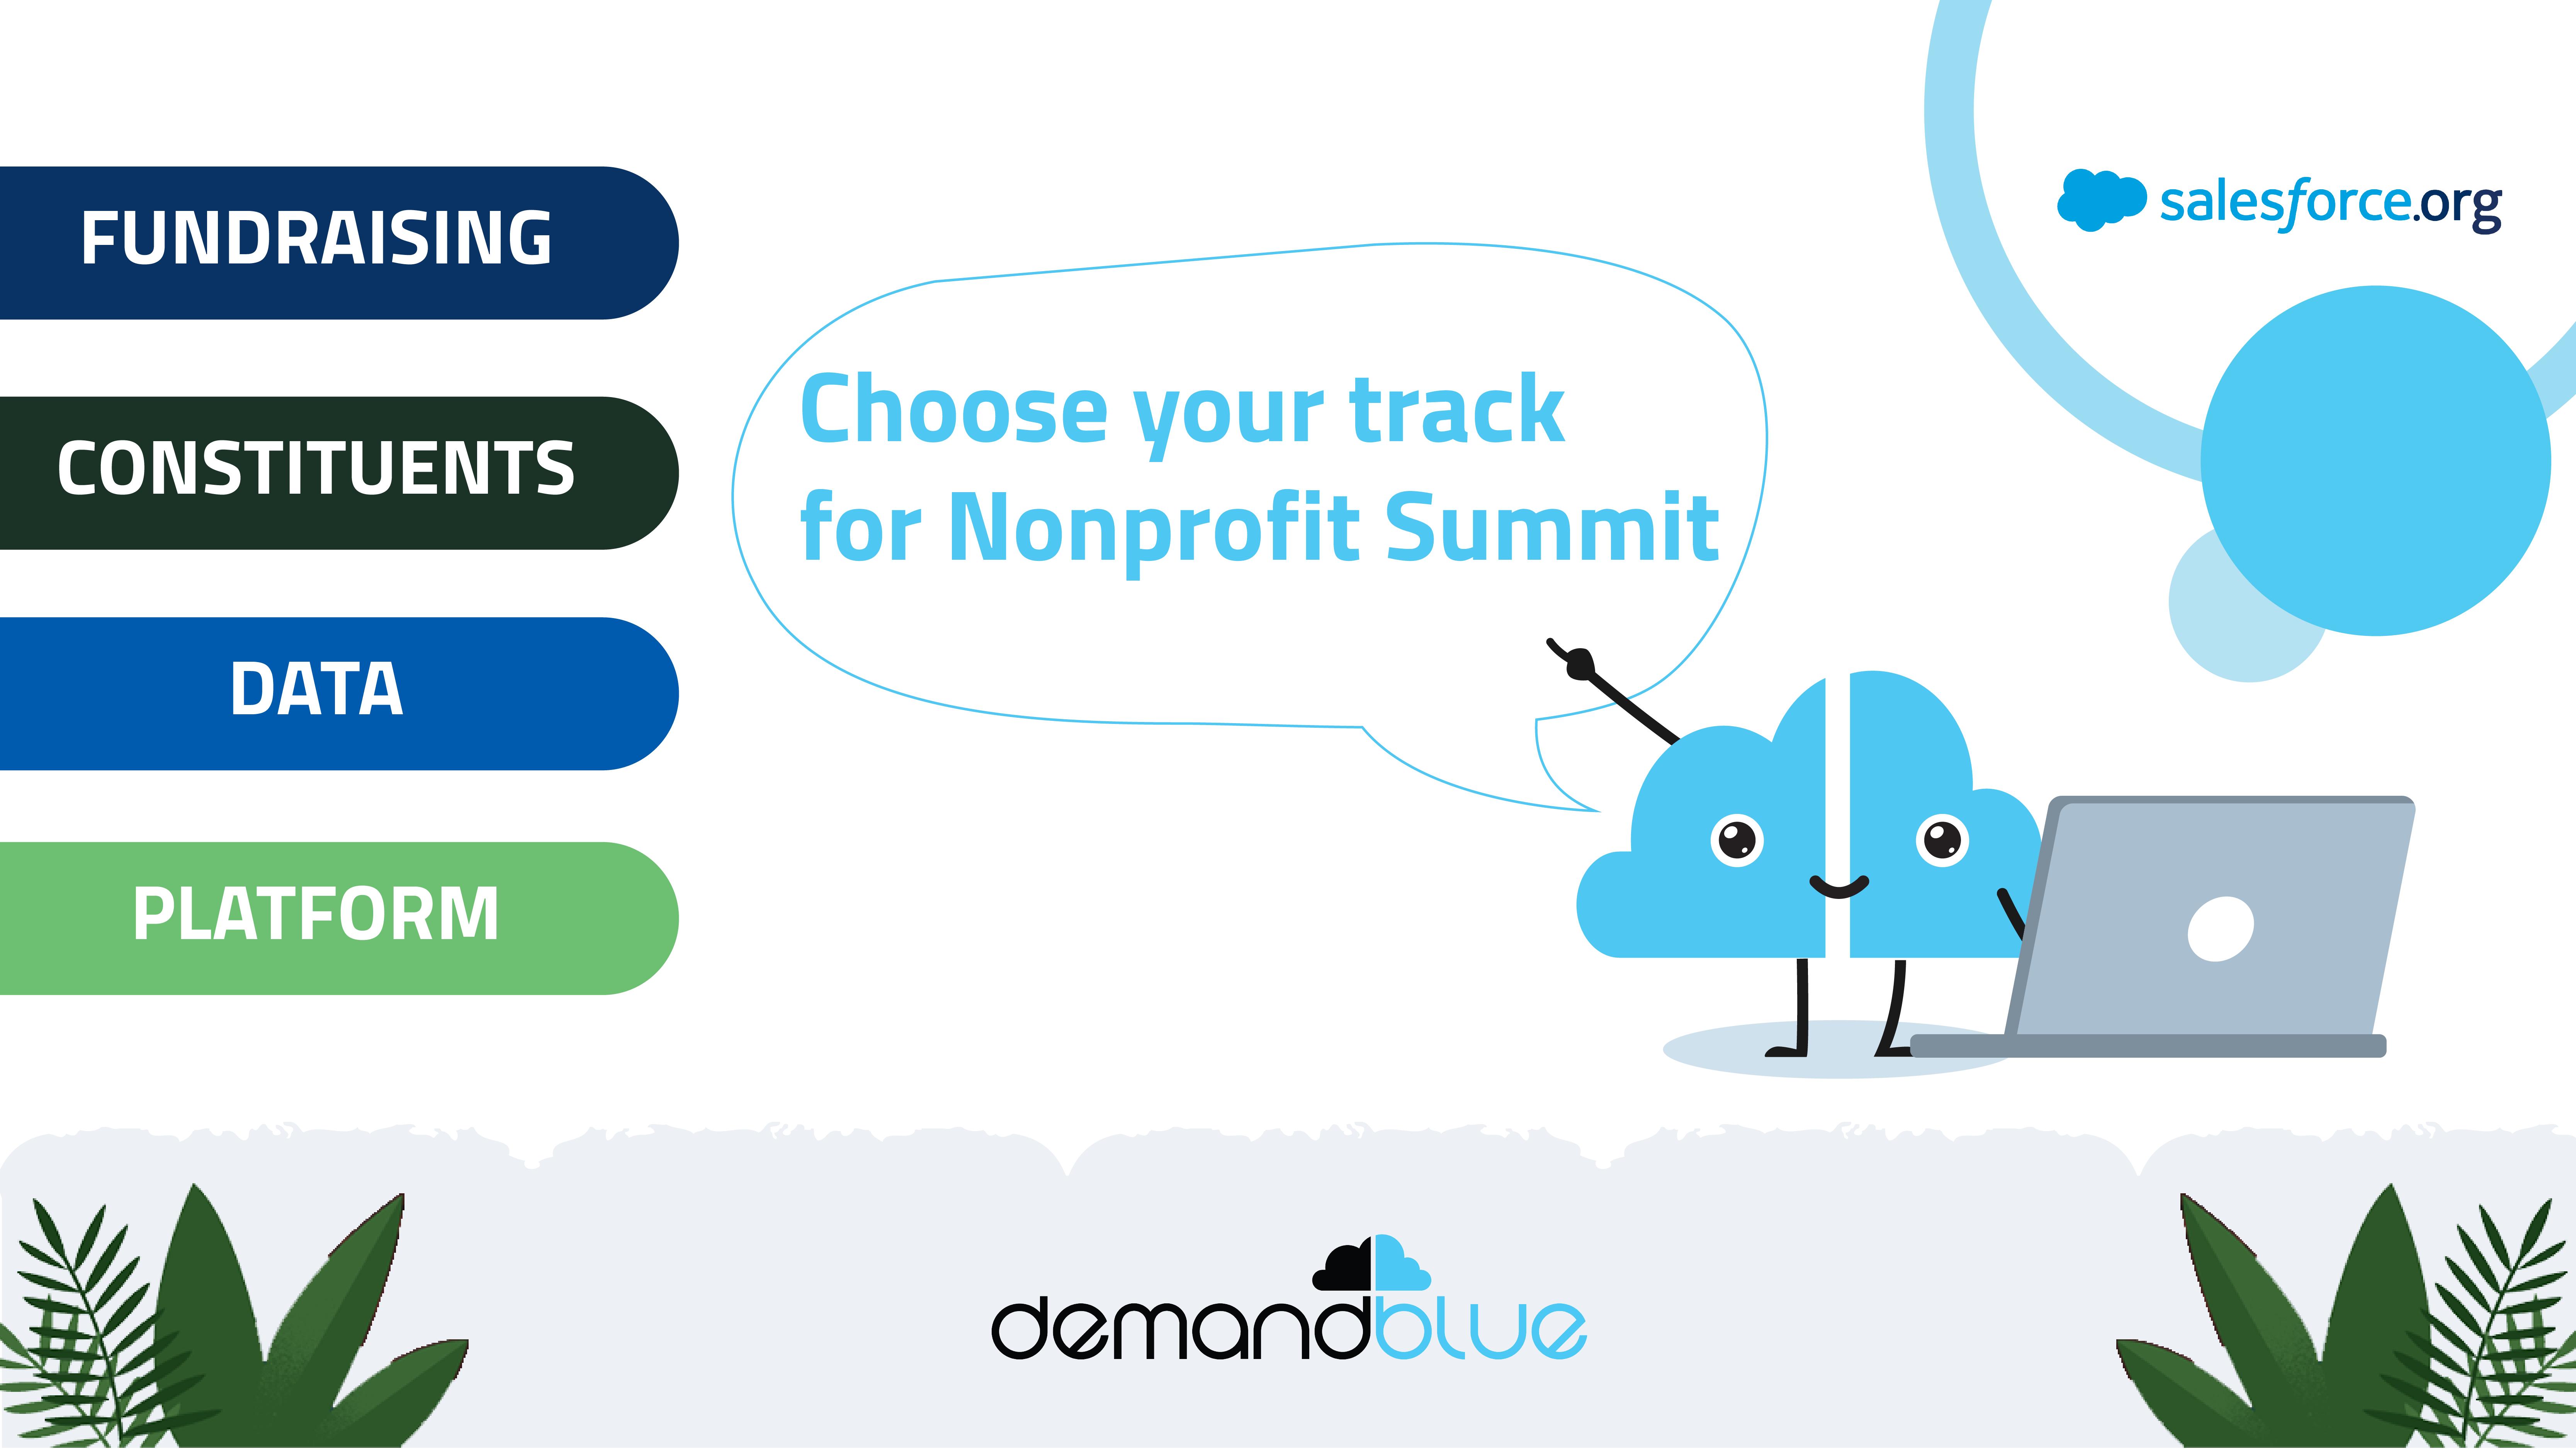 4 Tracks for Nonprofit Success at #NonprofitSummit21